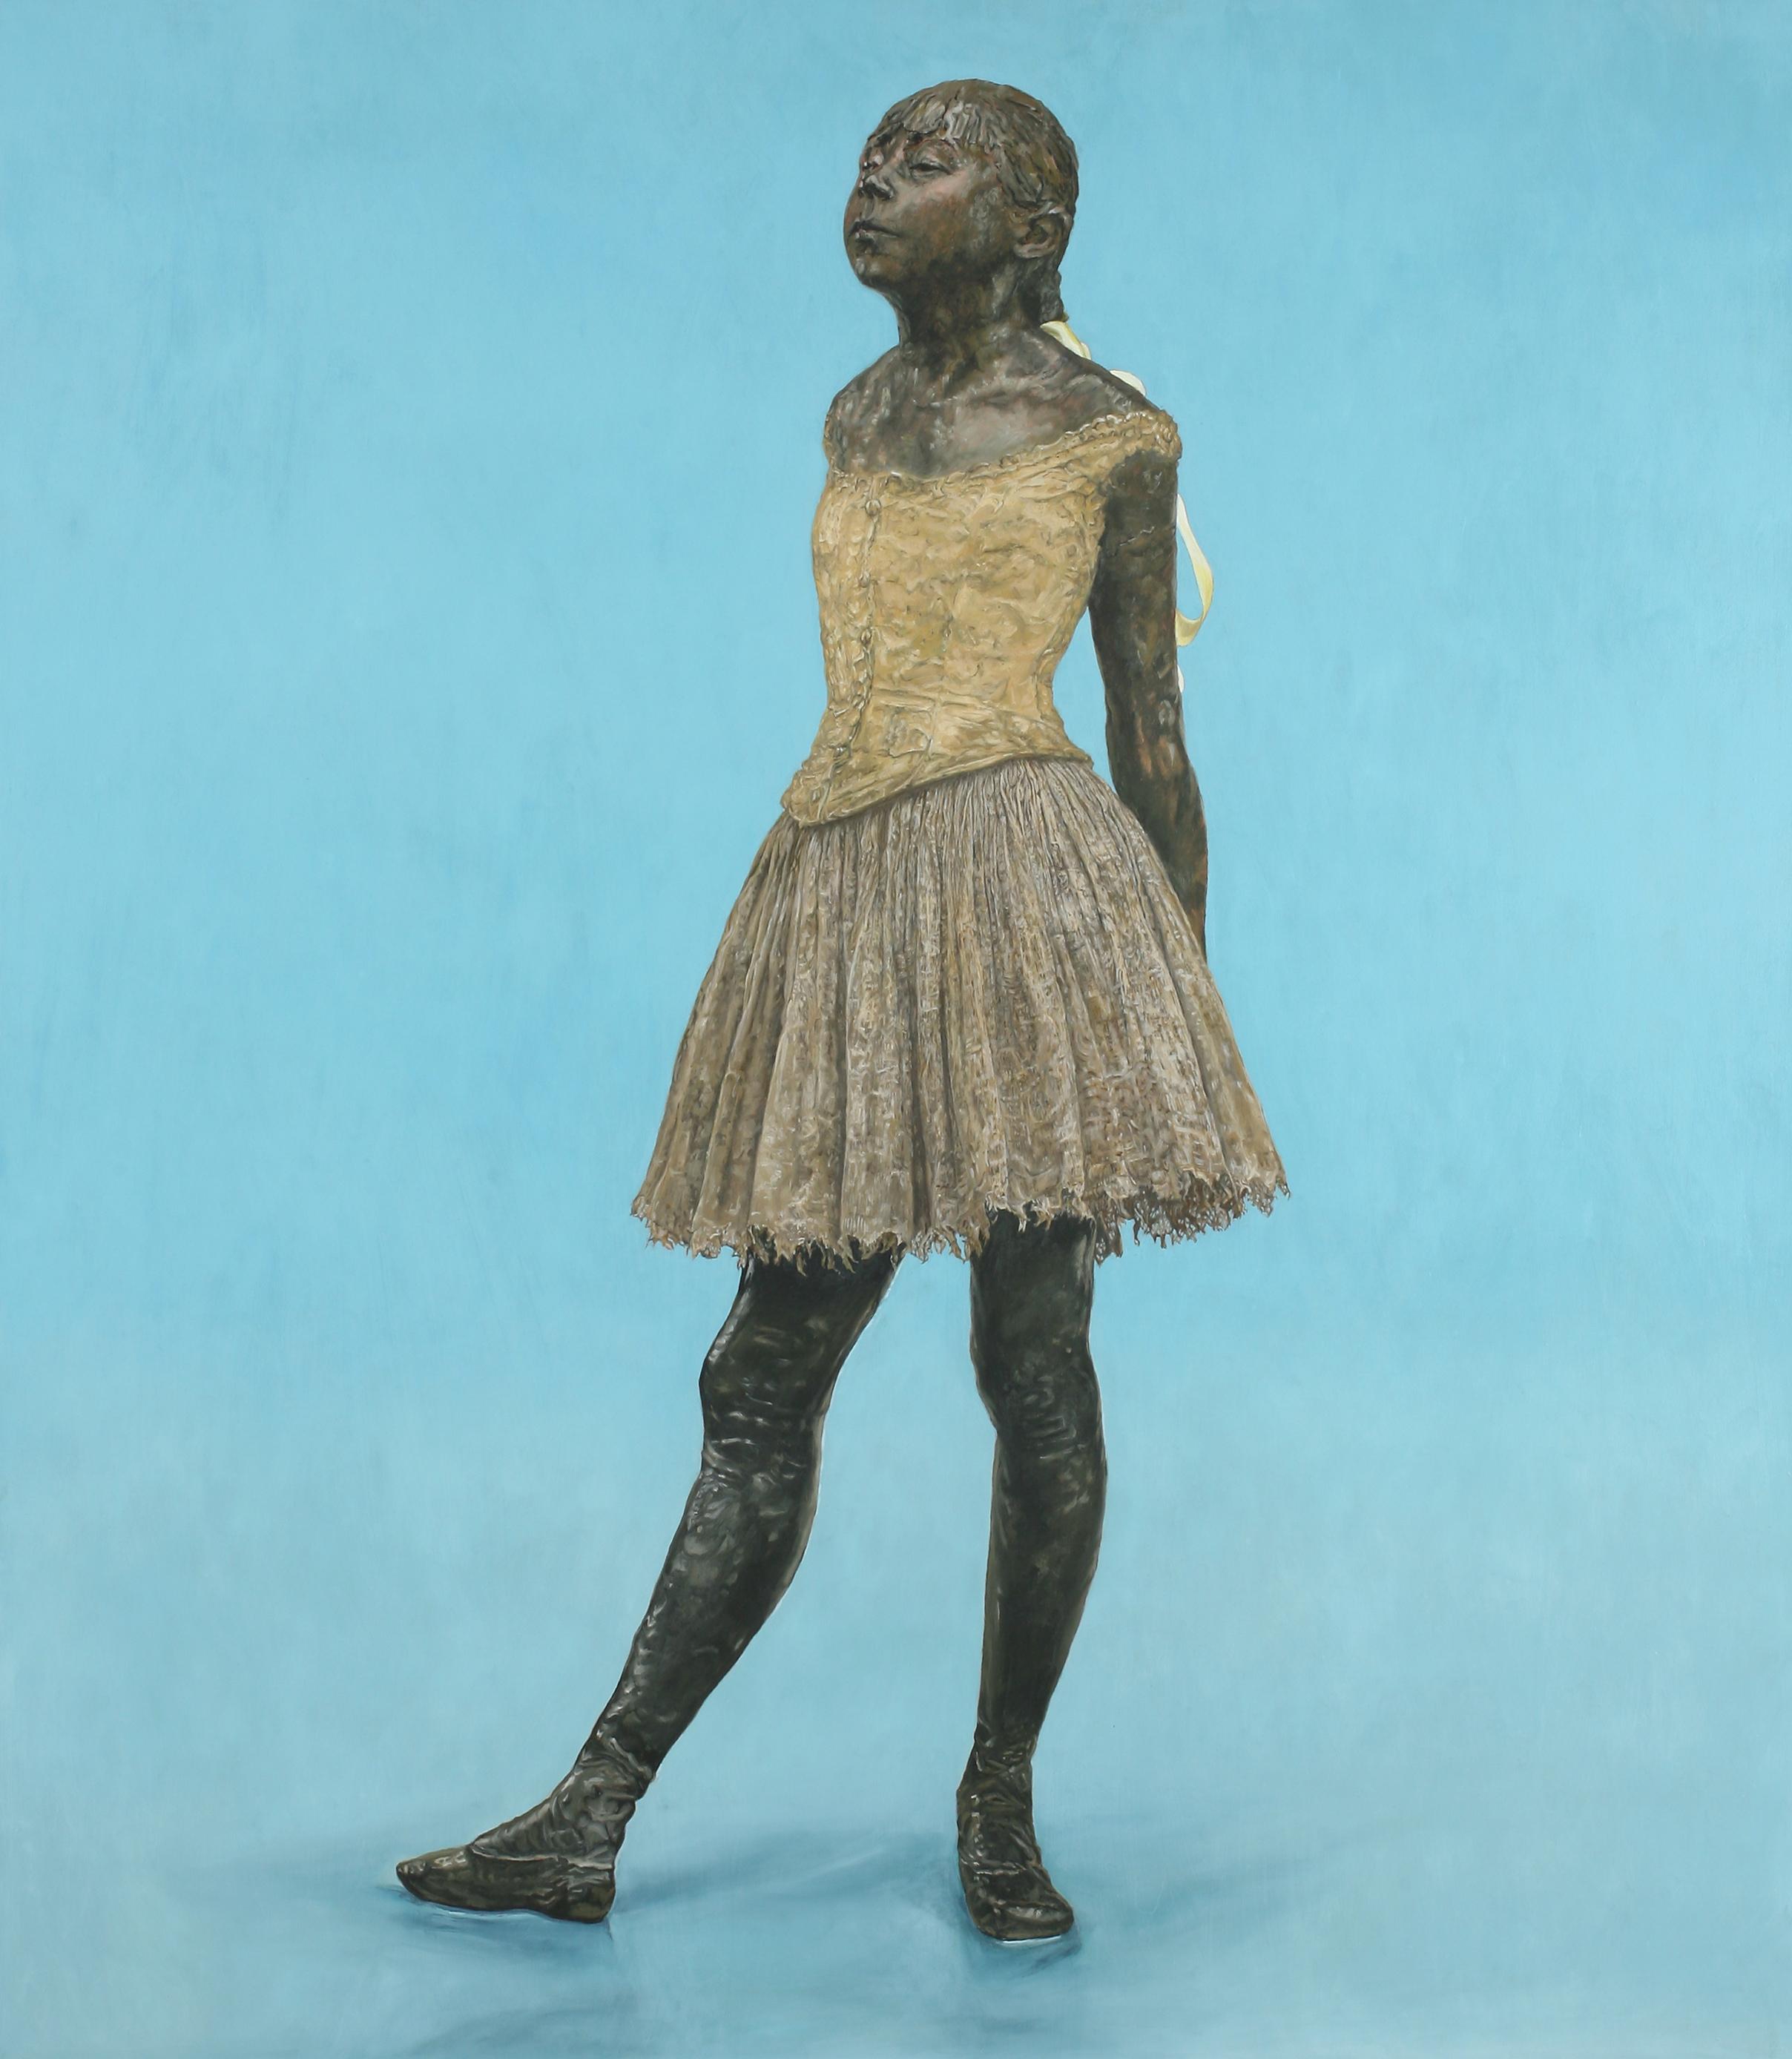 Little Fourteen-Year-Old Dancer on Blue